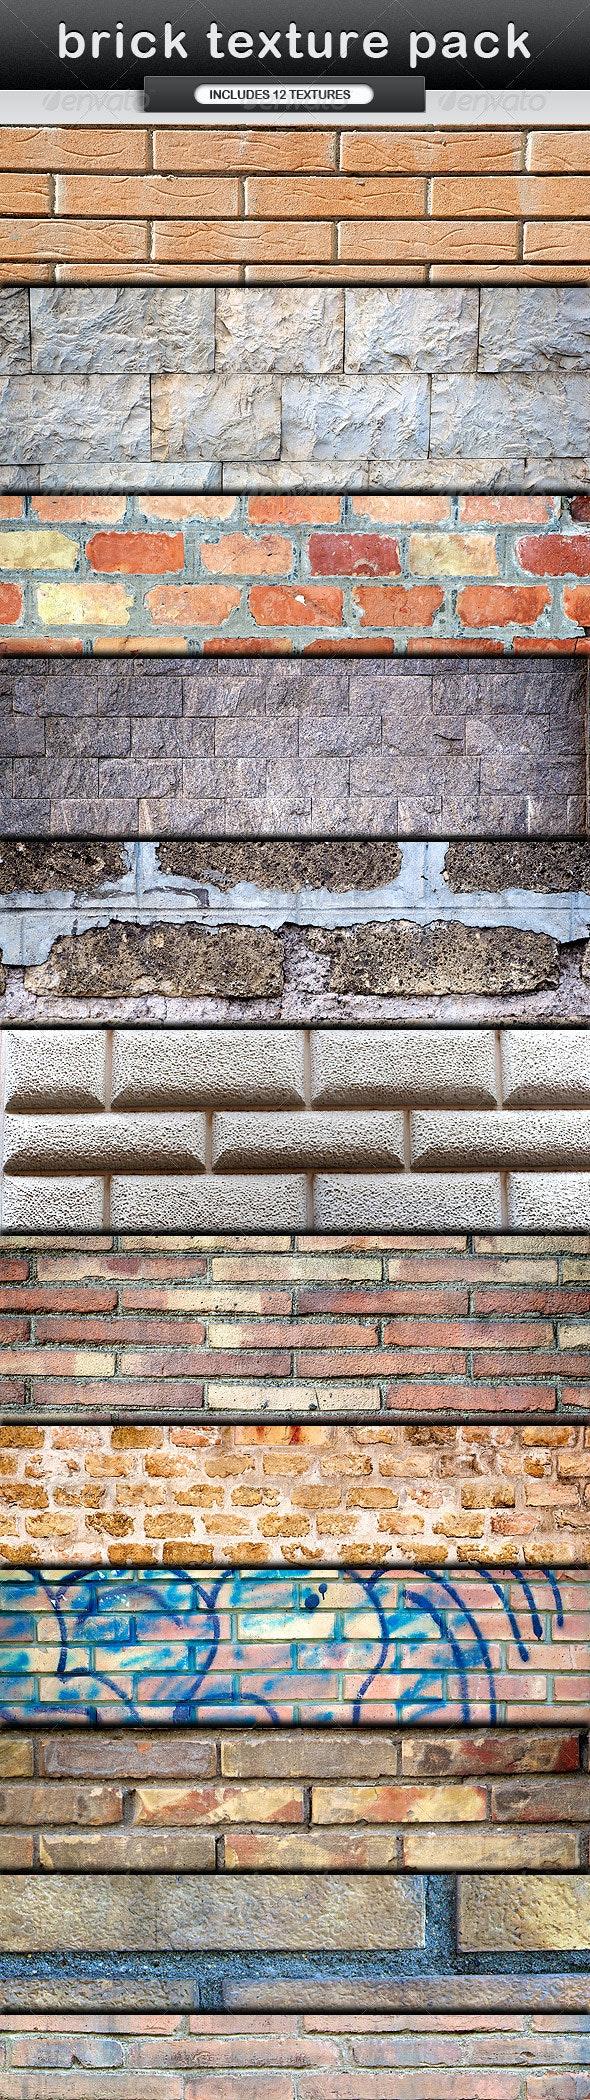 Brick Texture Pack - Stone Textures